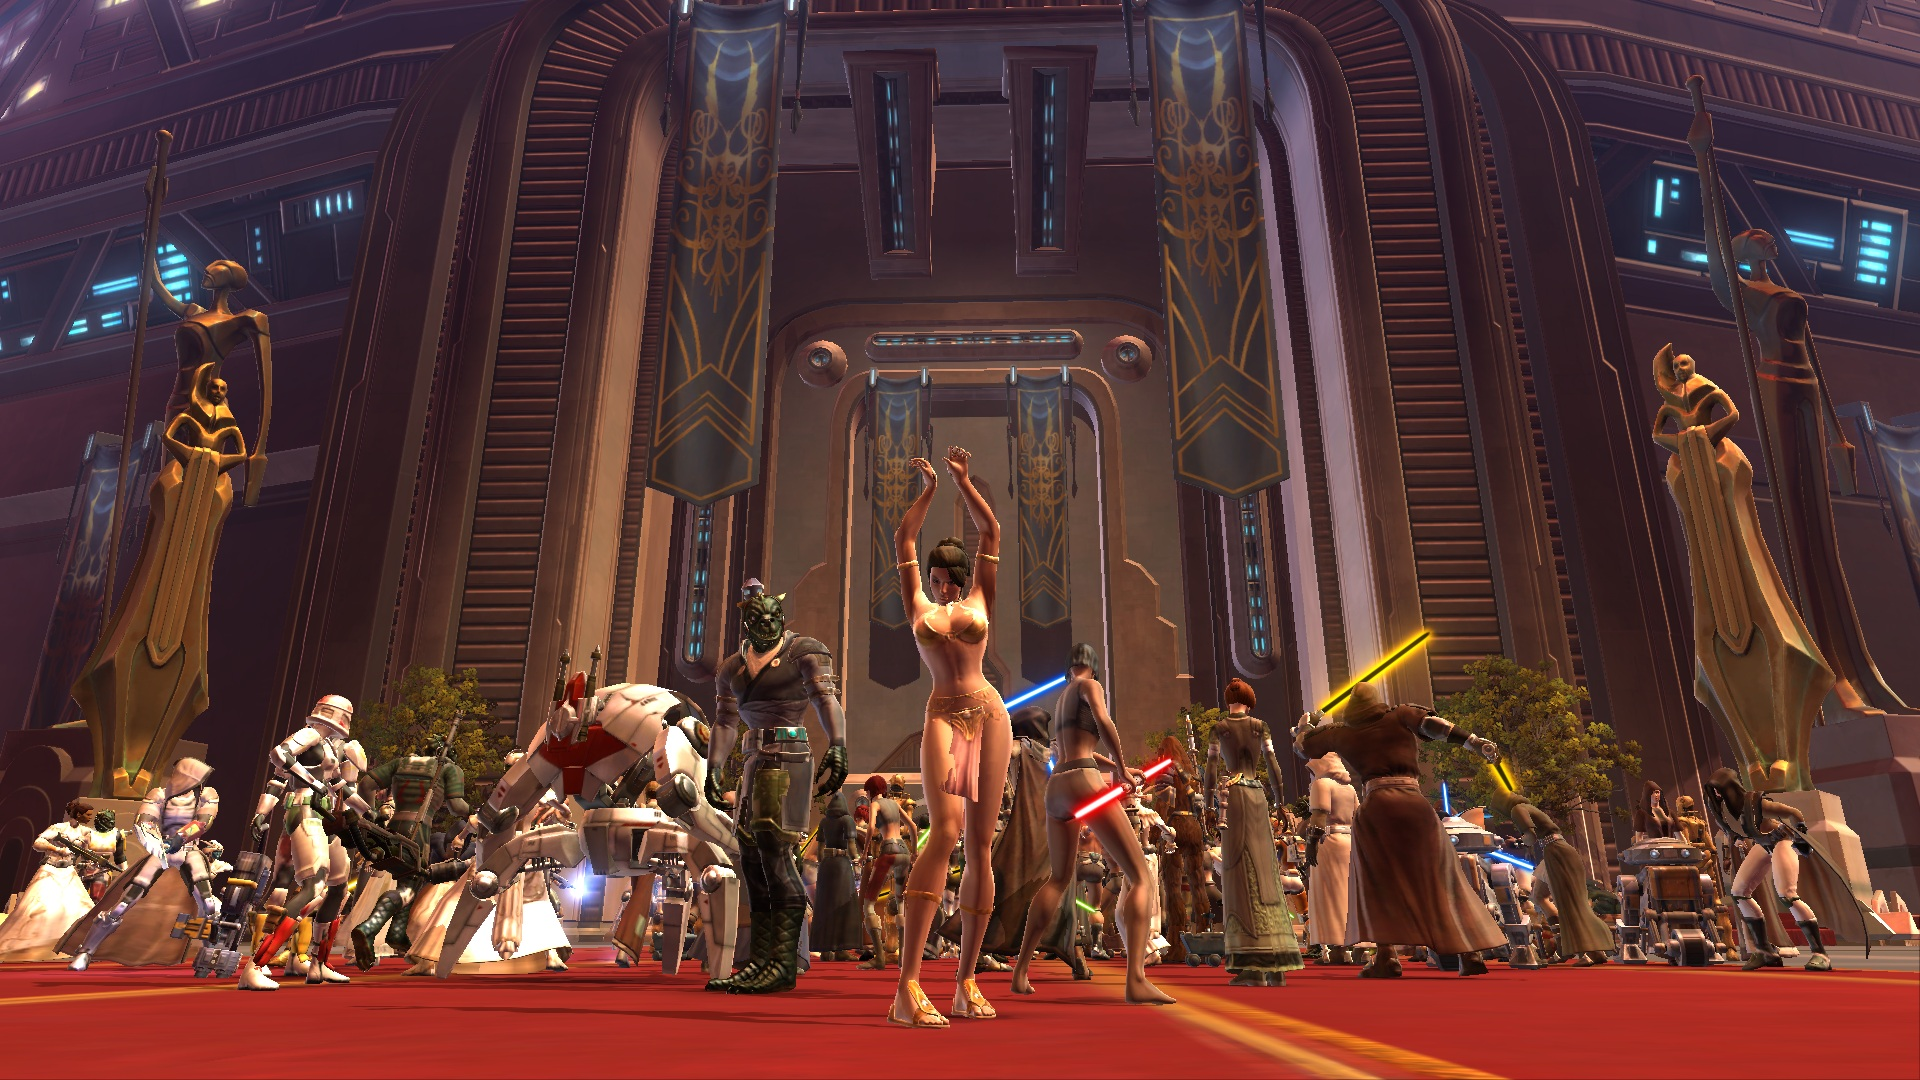 Kotor nudity pron scenes